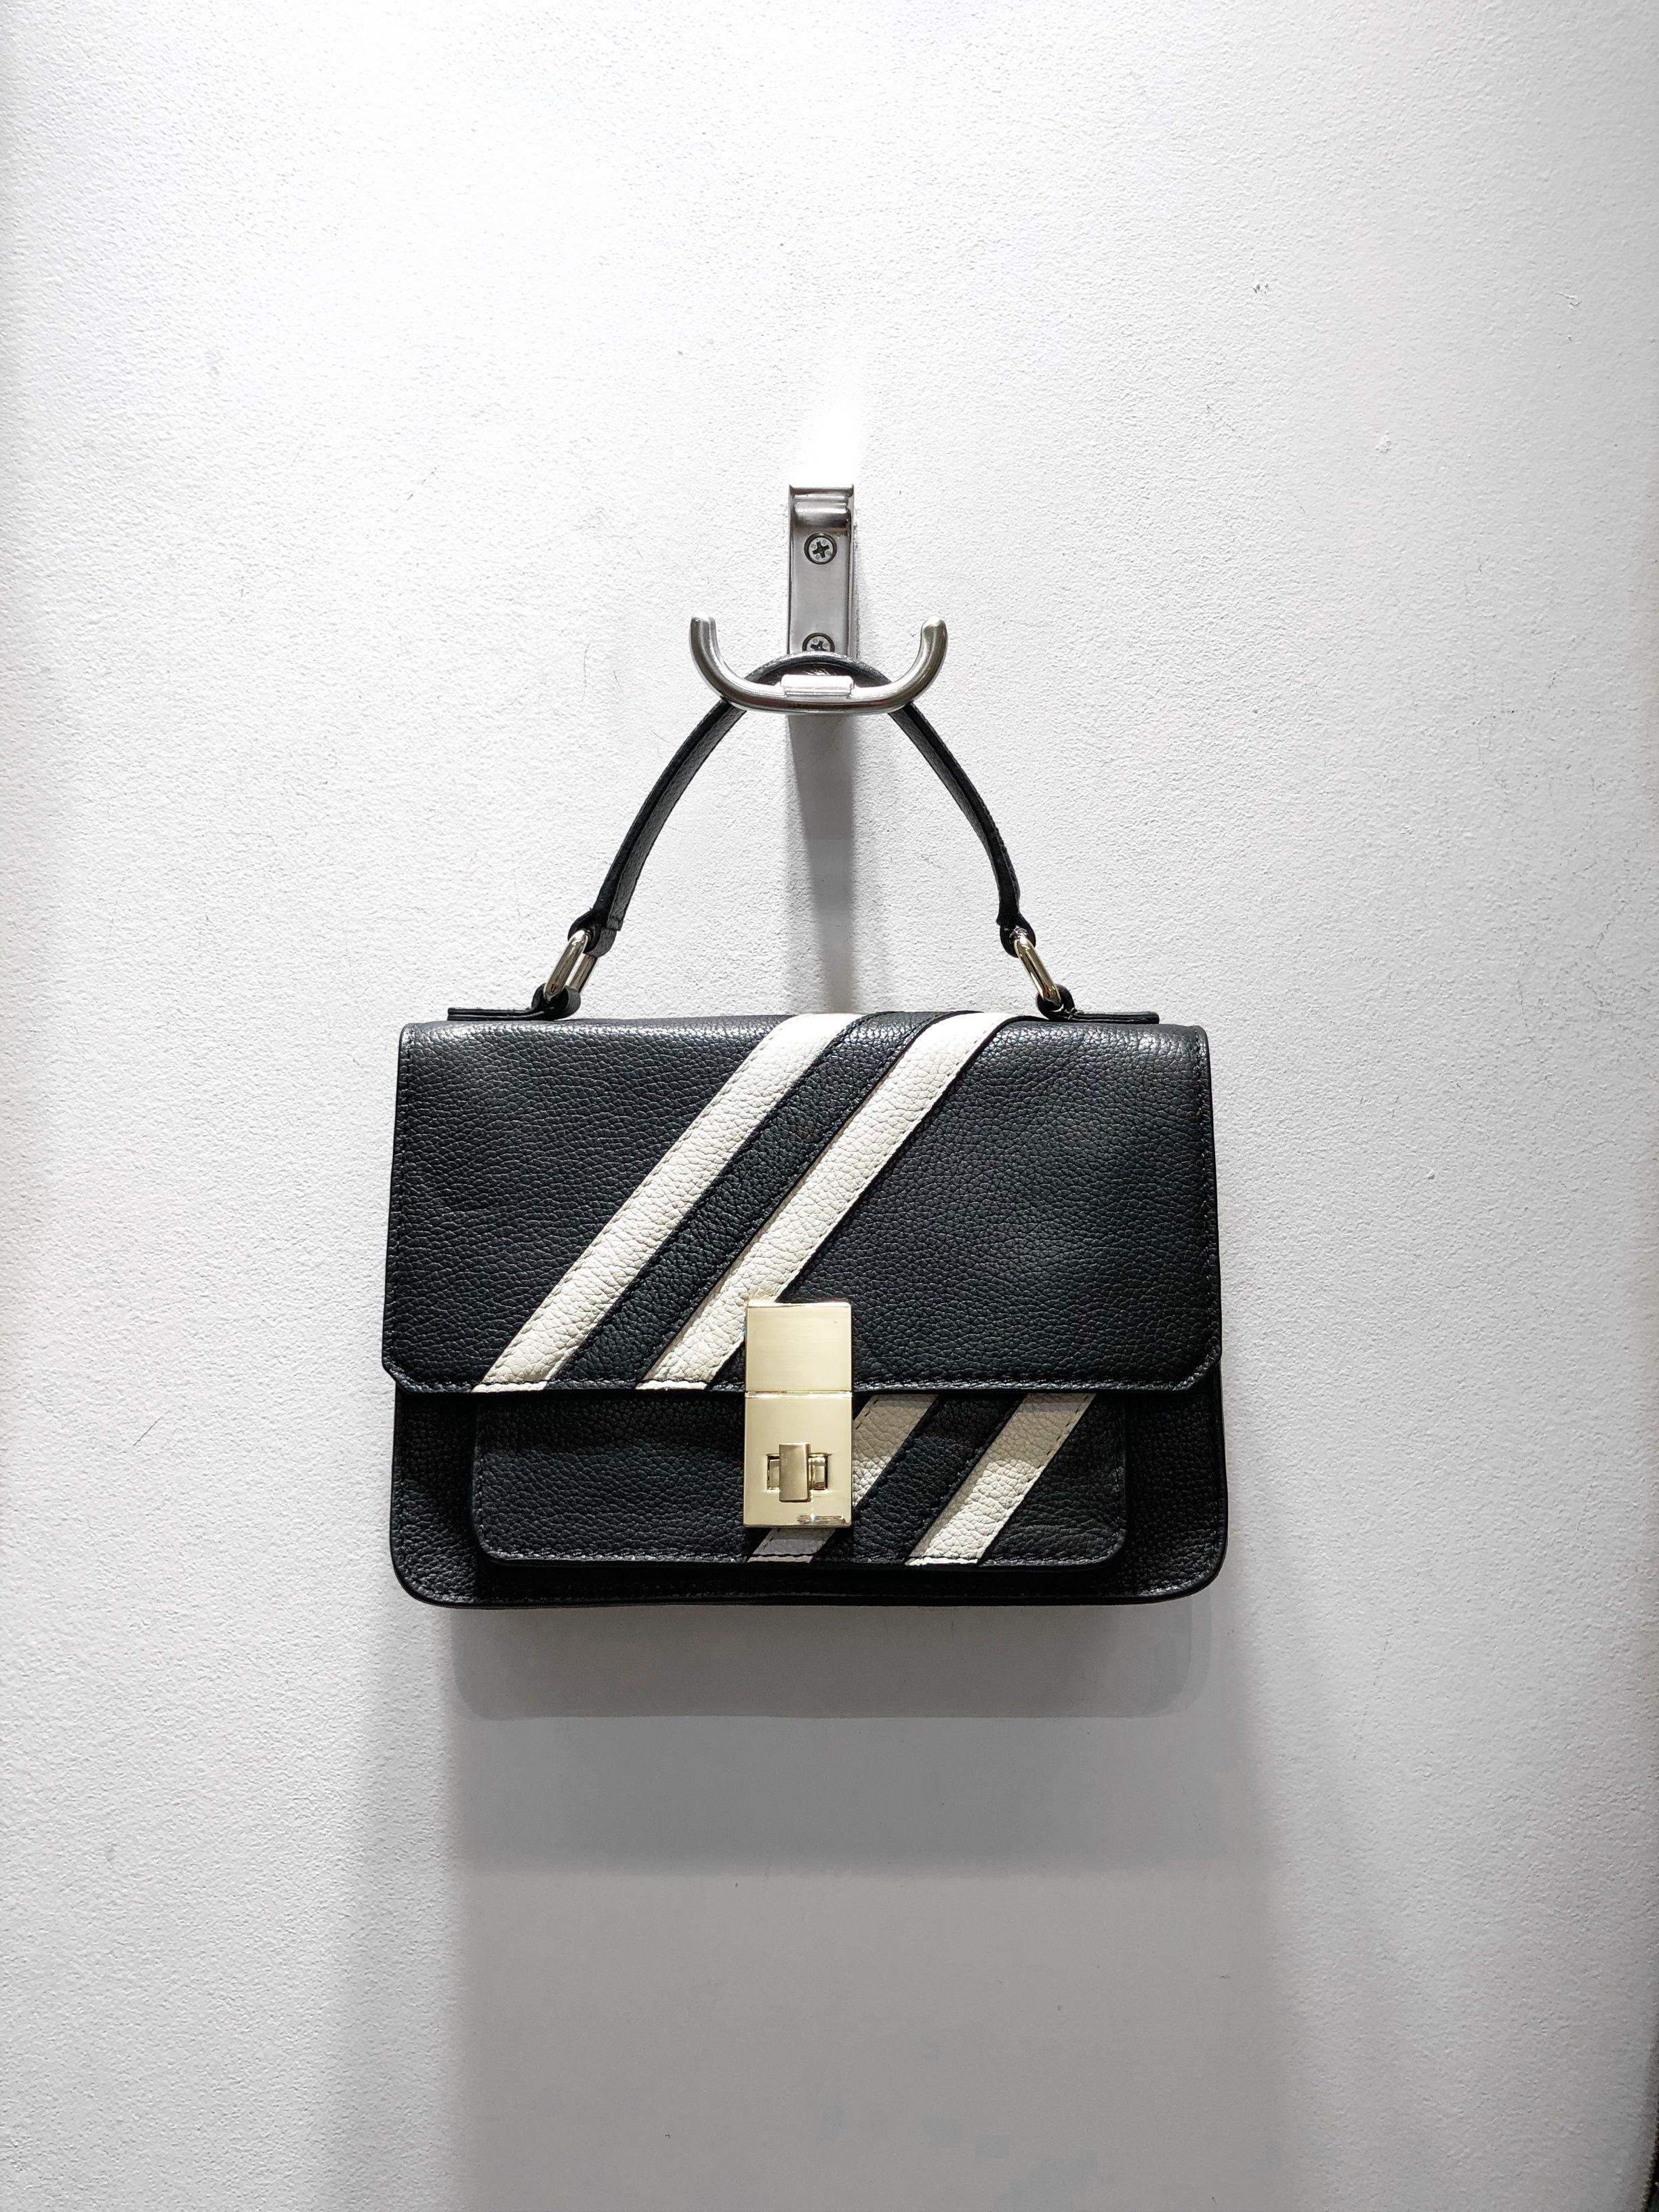 Leather Stripe Shoulder Bag From Amanda Lamb For Qvc Uk Handbagsqvcuk Leather Backpack Purse Trendy Purses